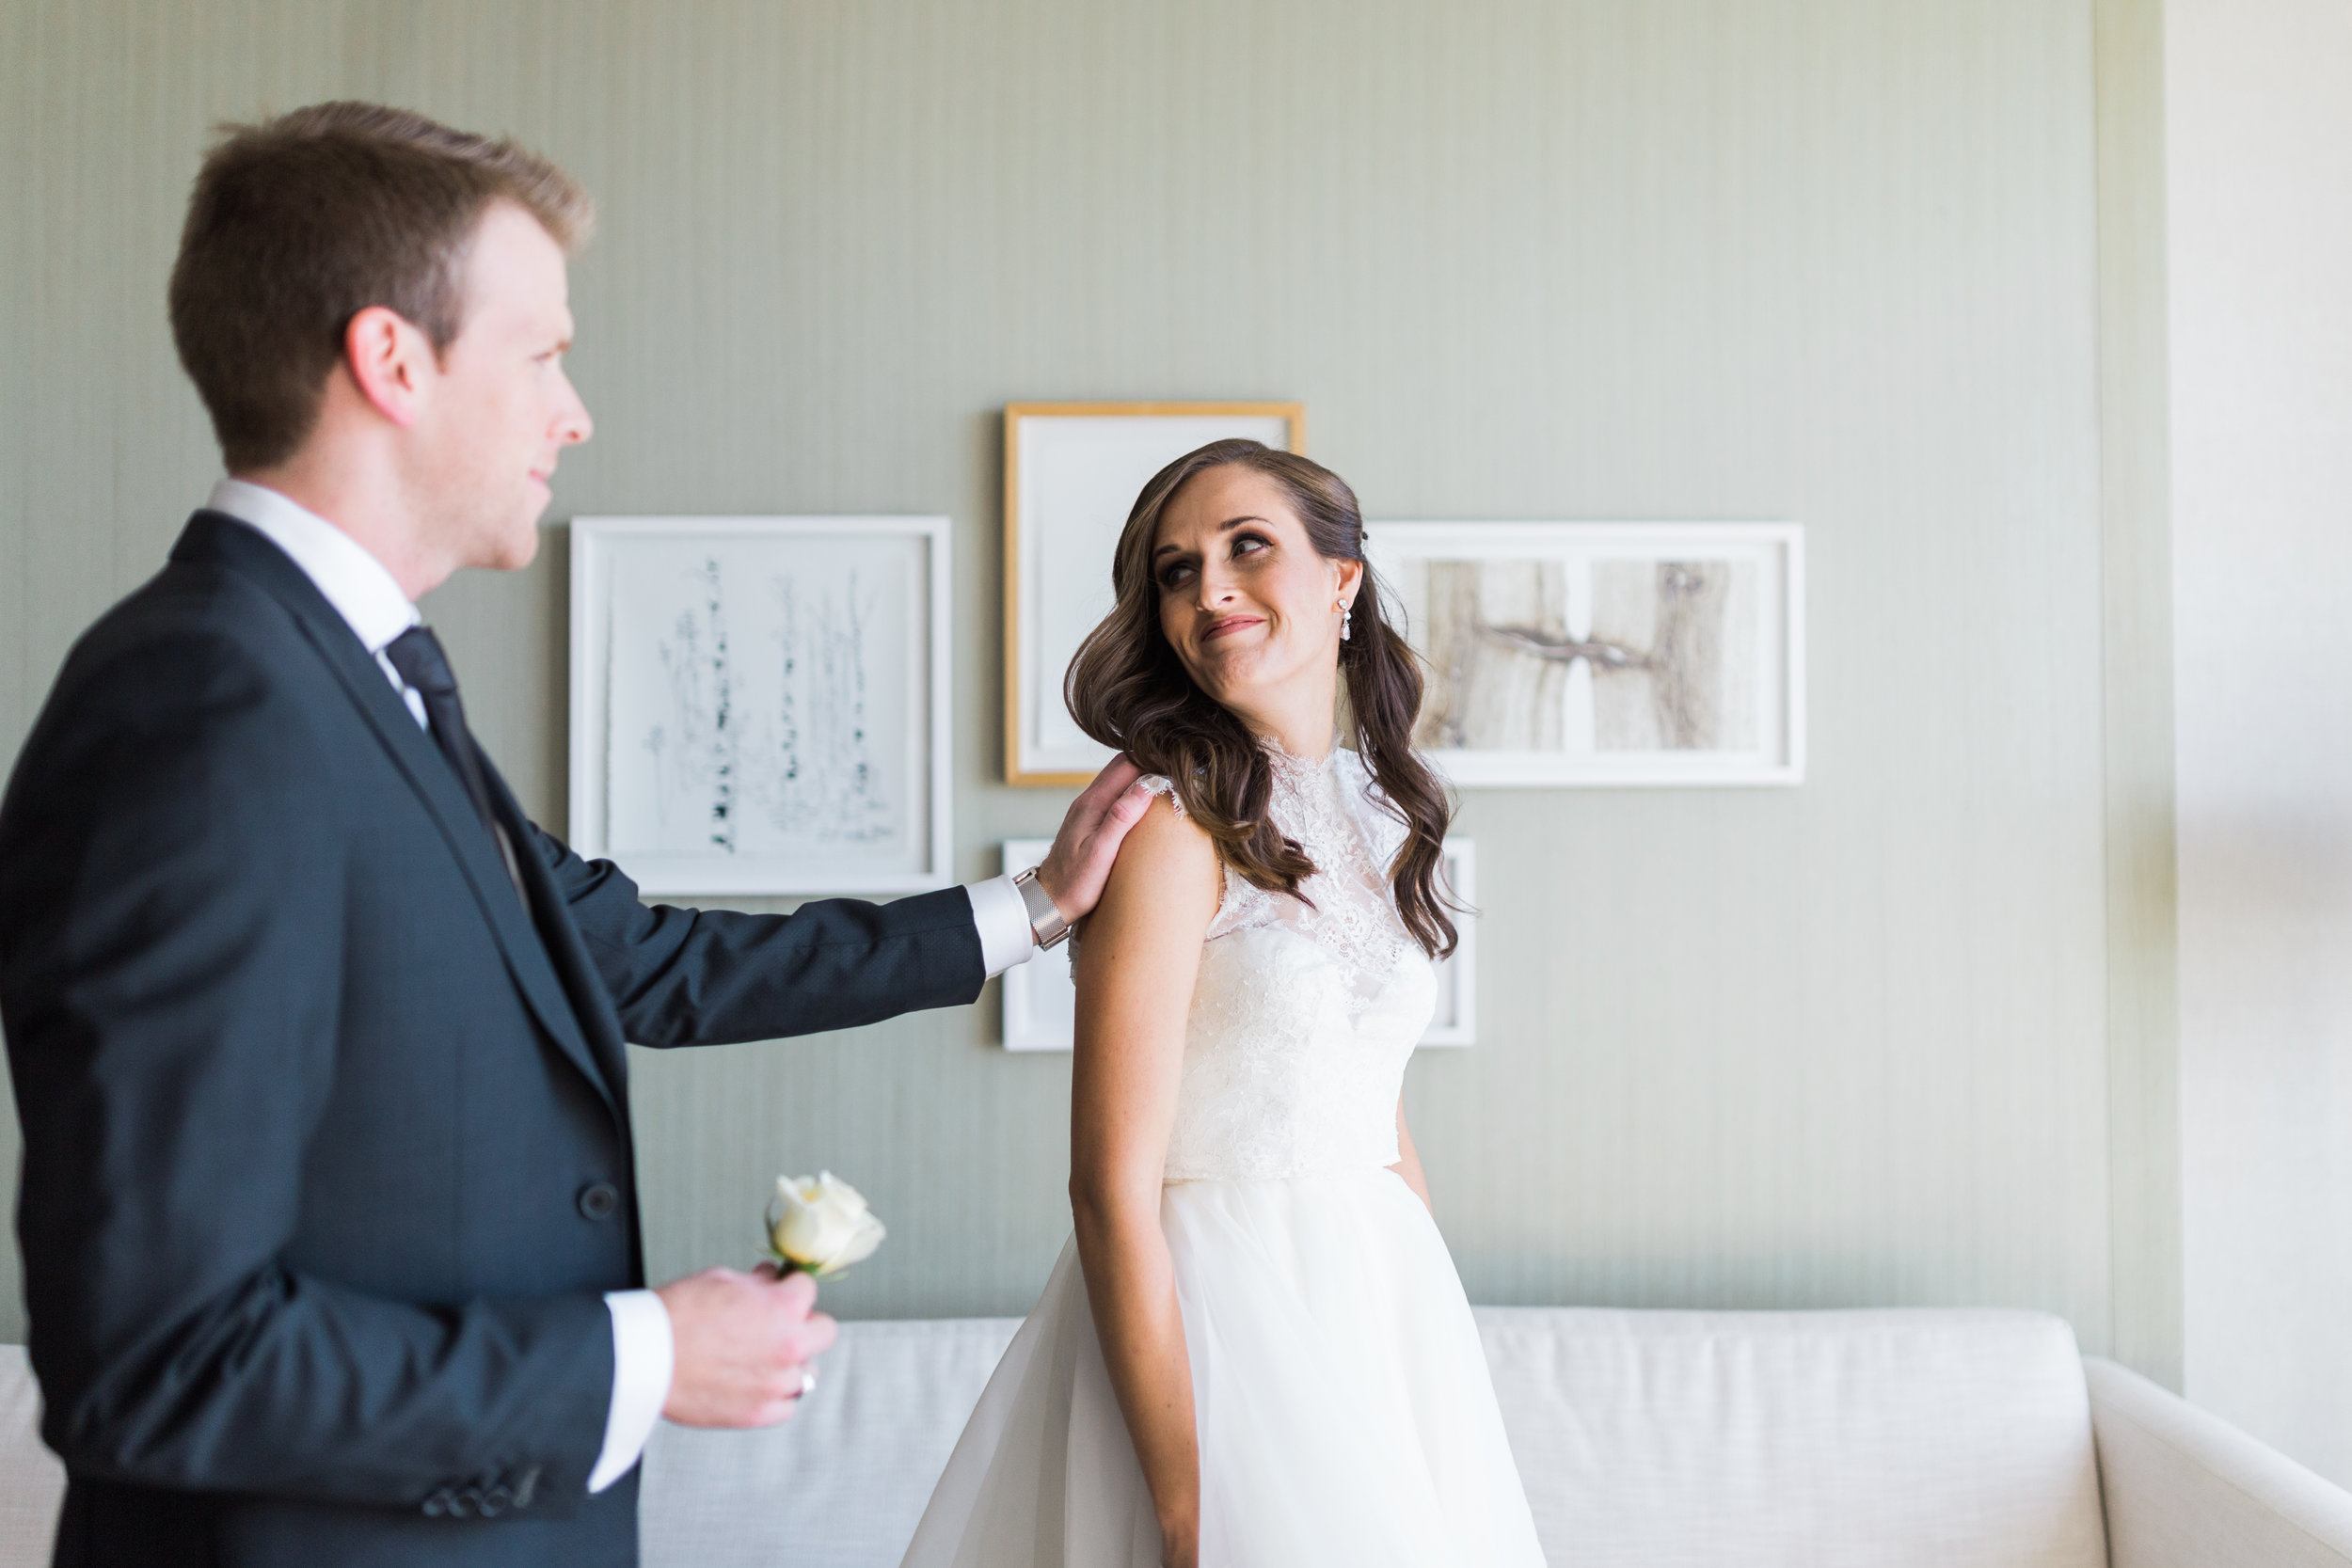 Toronto Fine Art Photographer - Four Seasons Yorkville Wedding - First Look-2.jpg